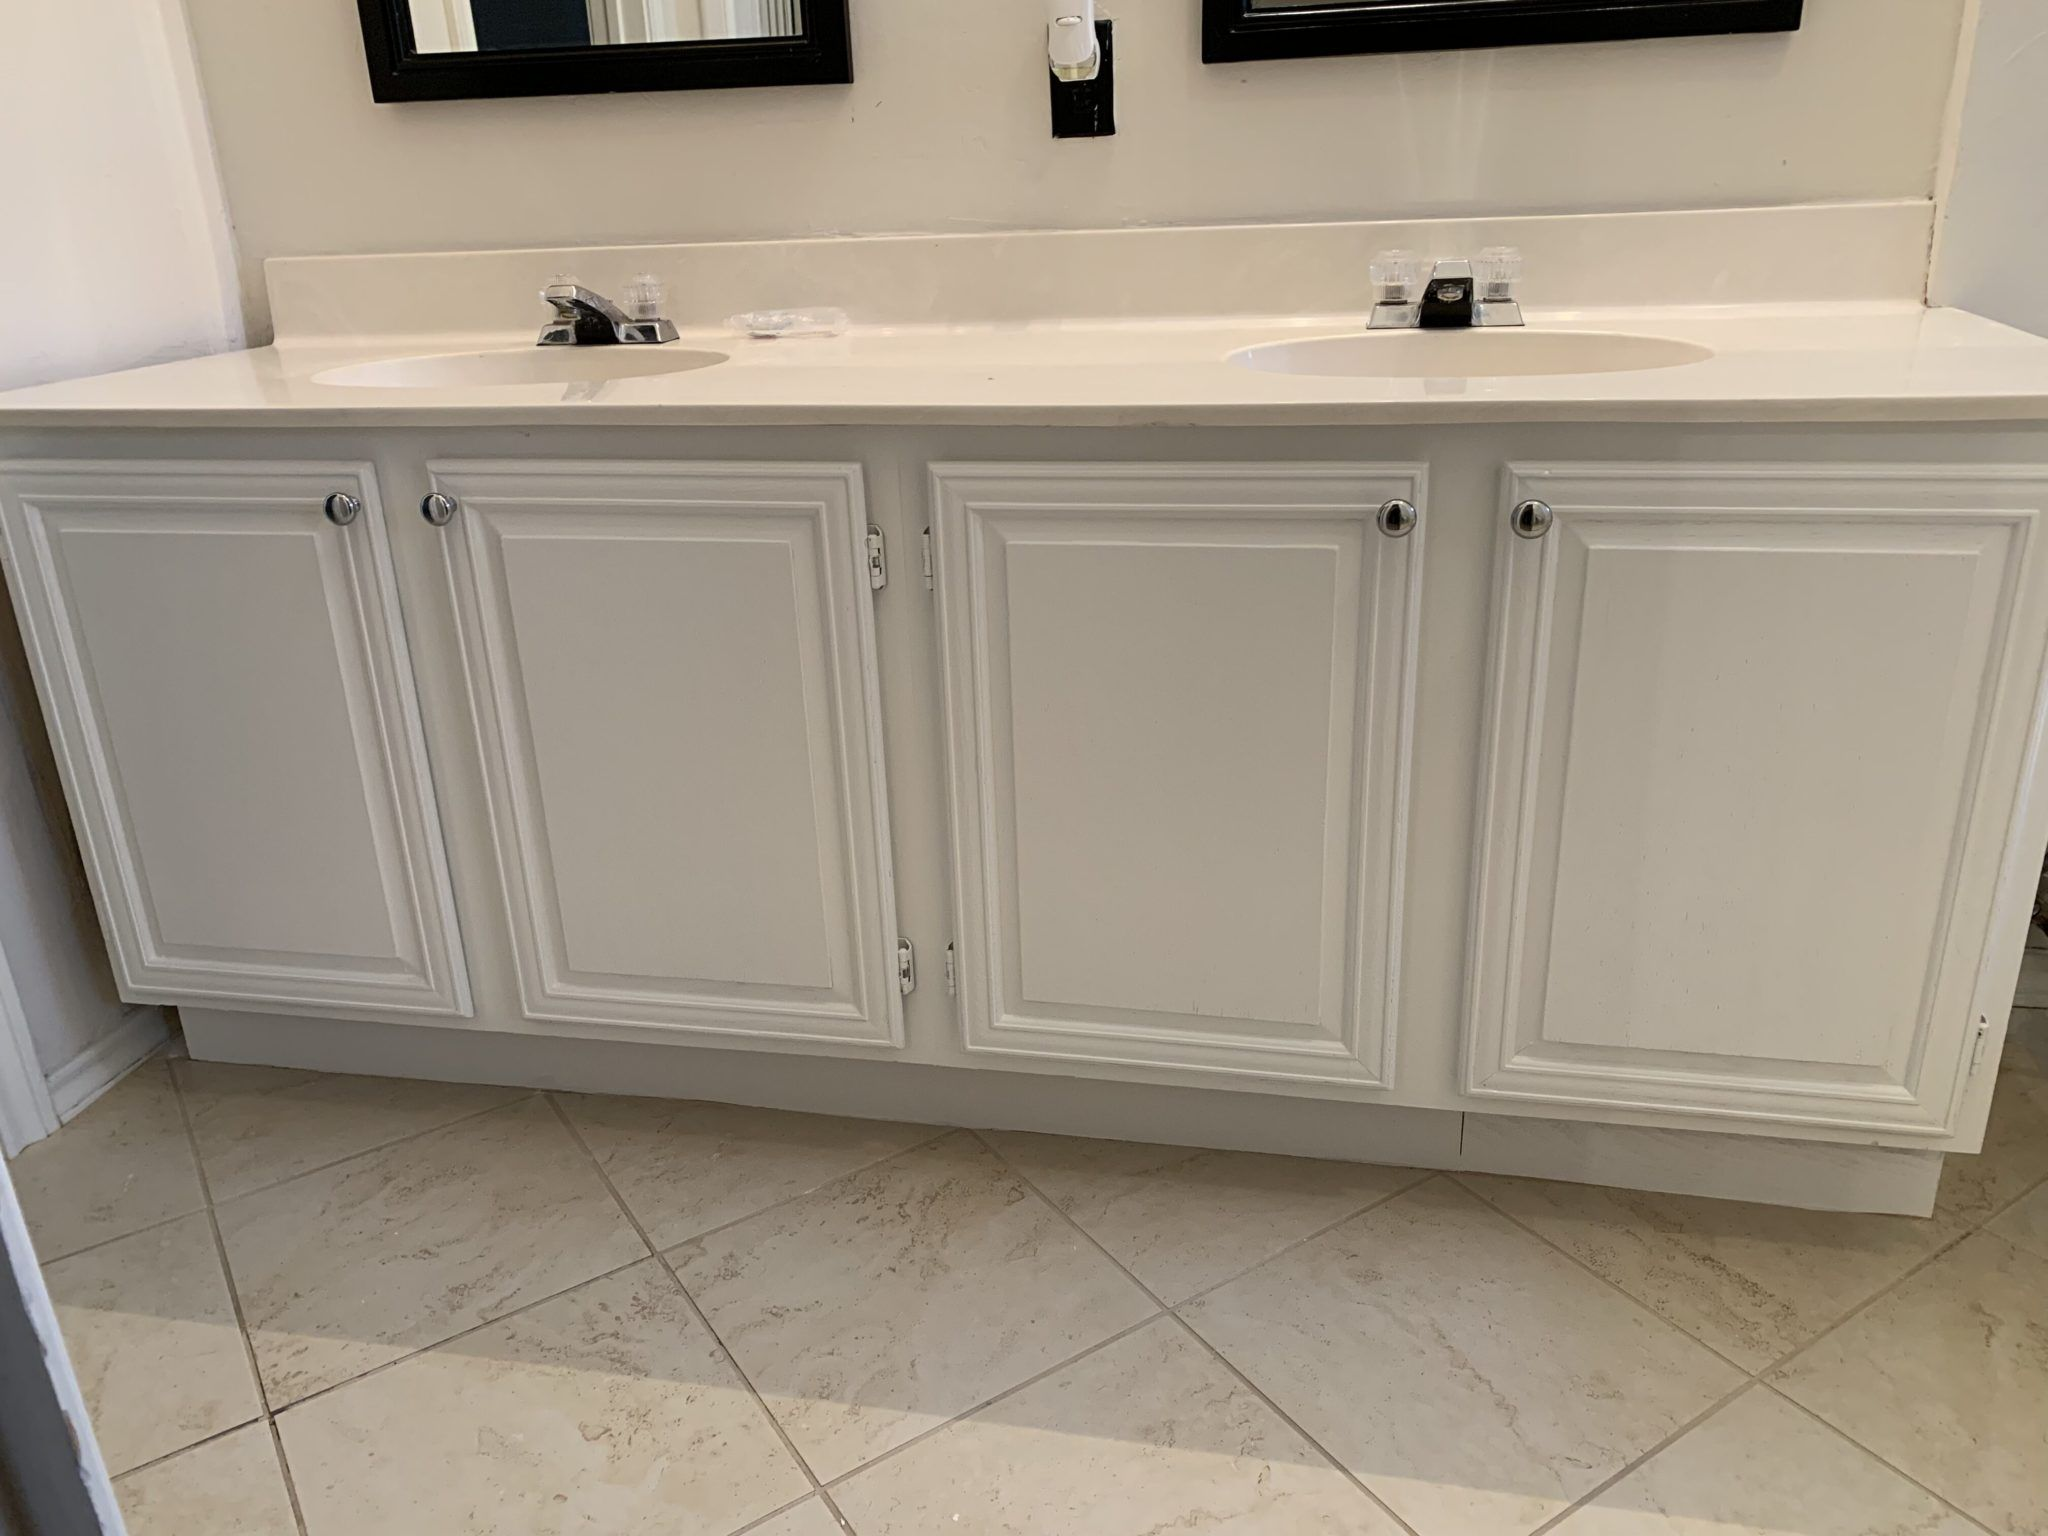 Painted Bathroom Vanity Inspiration Dfw Painting Refinishing Cabinets Painted Vanity Bathroom Vanity Inspiration